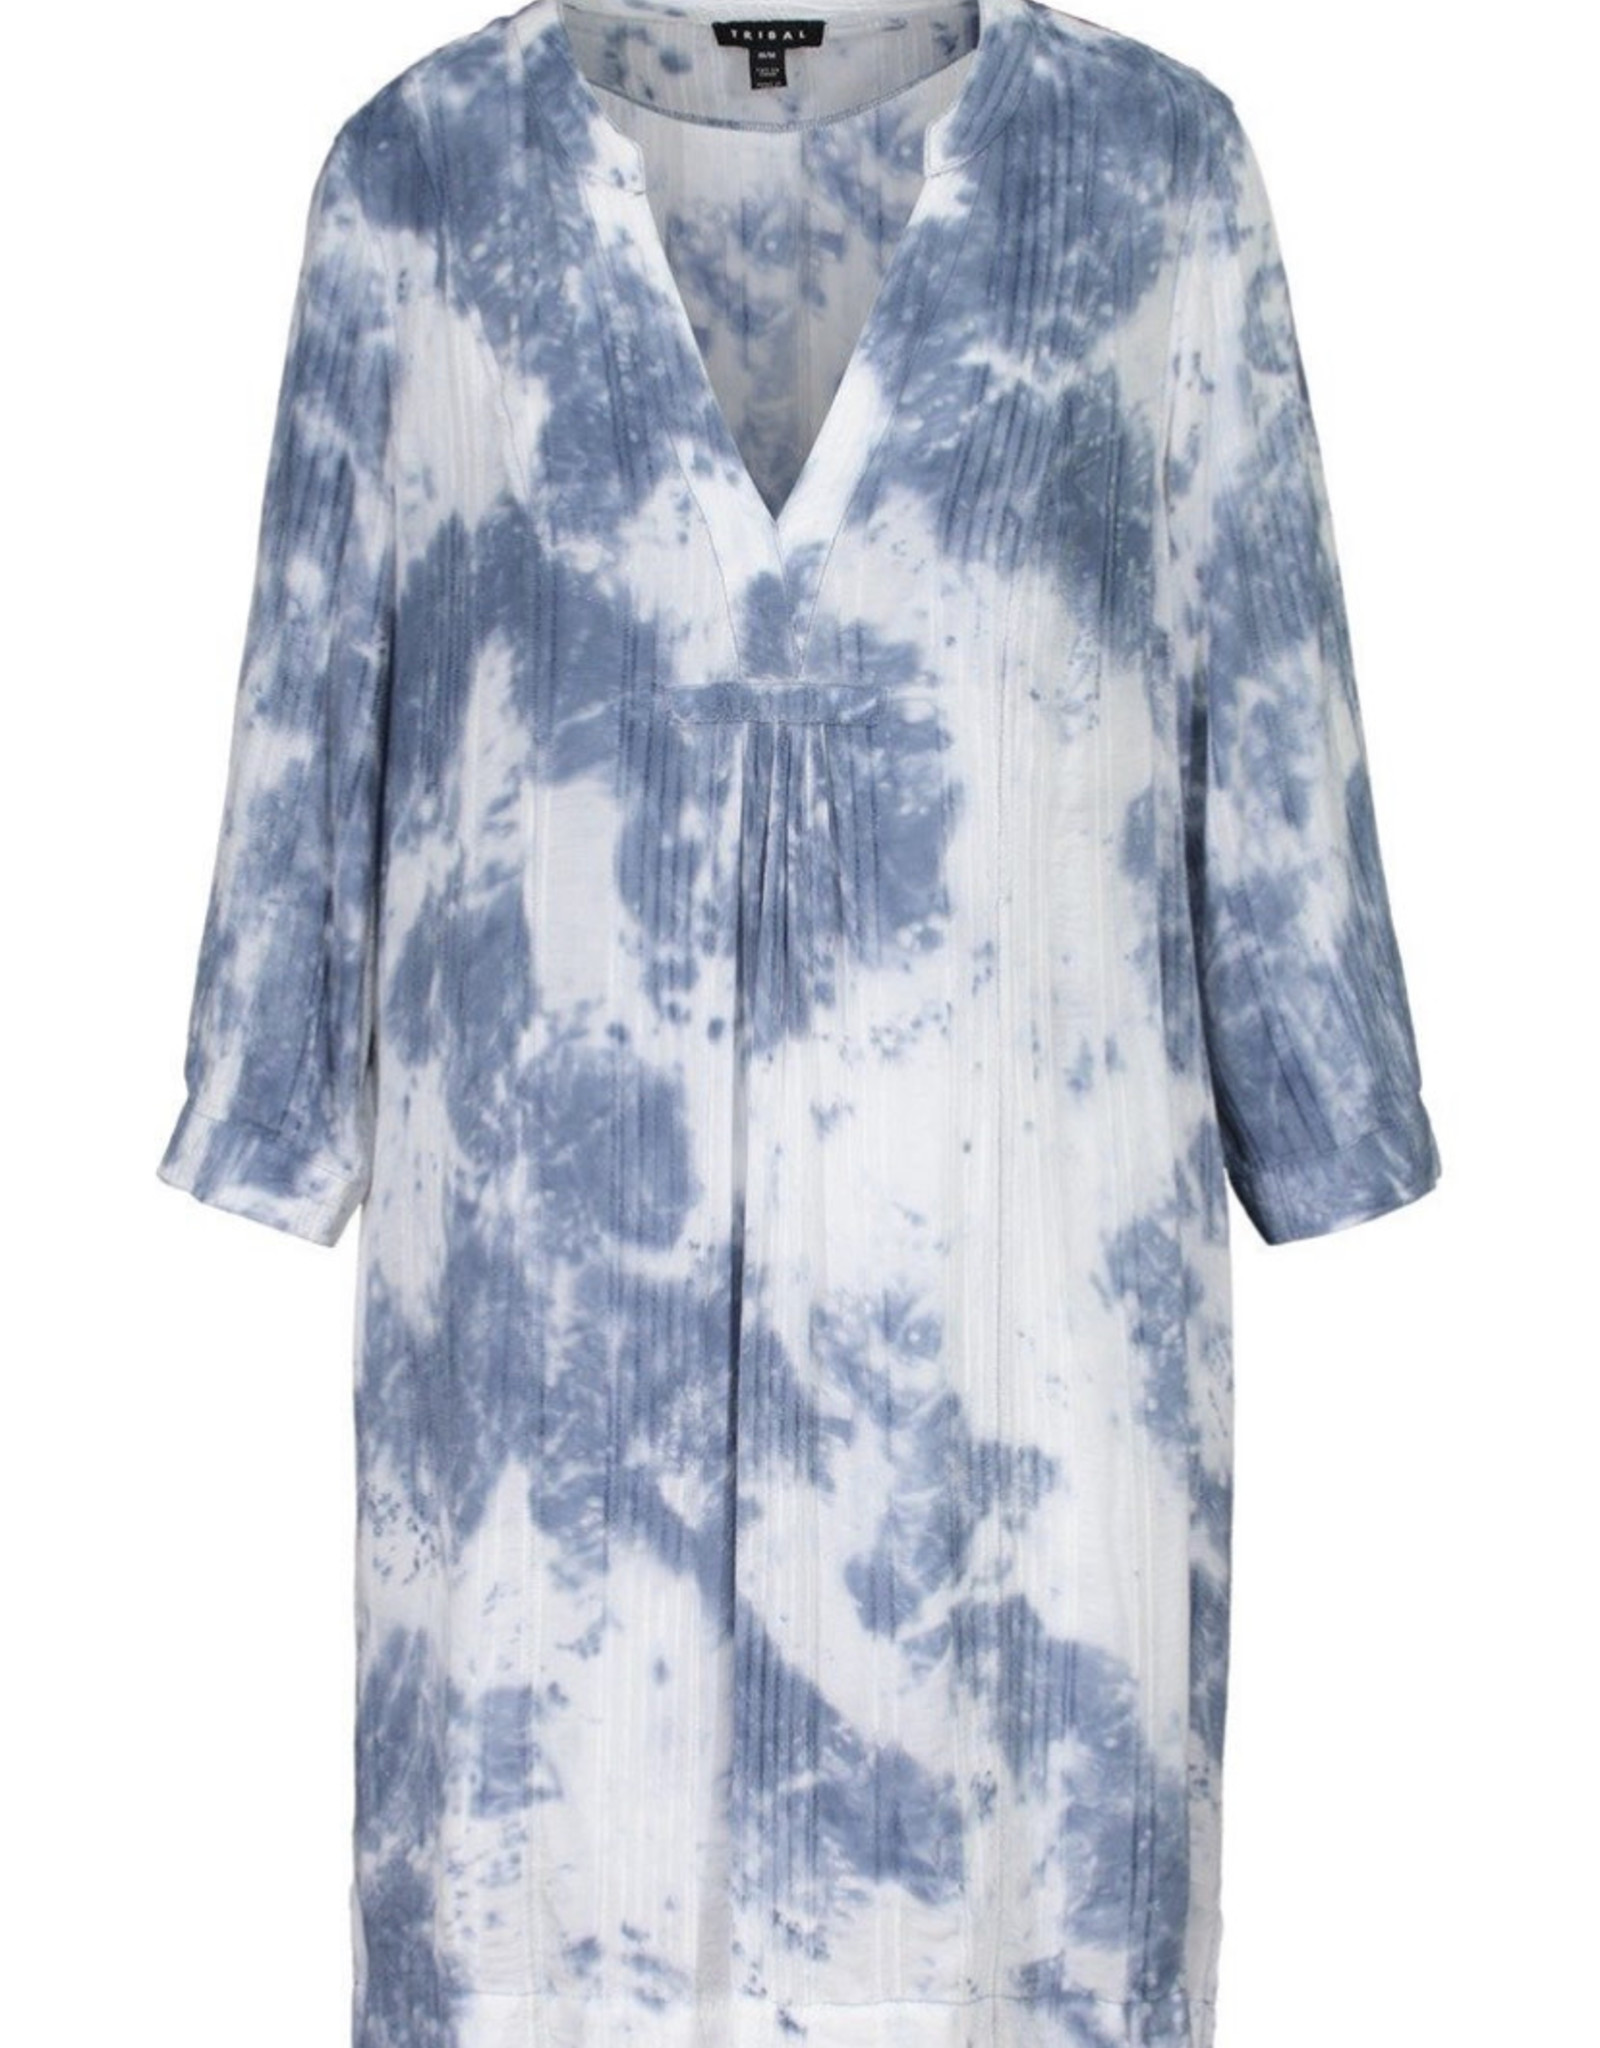 3/4 sleeve notch collar dress